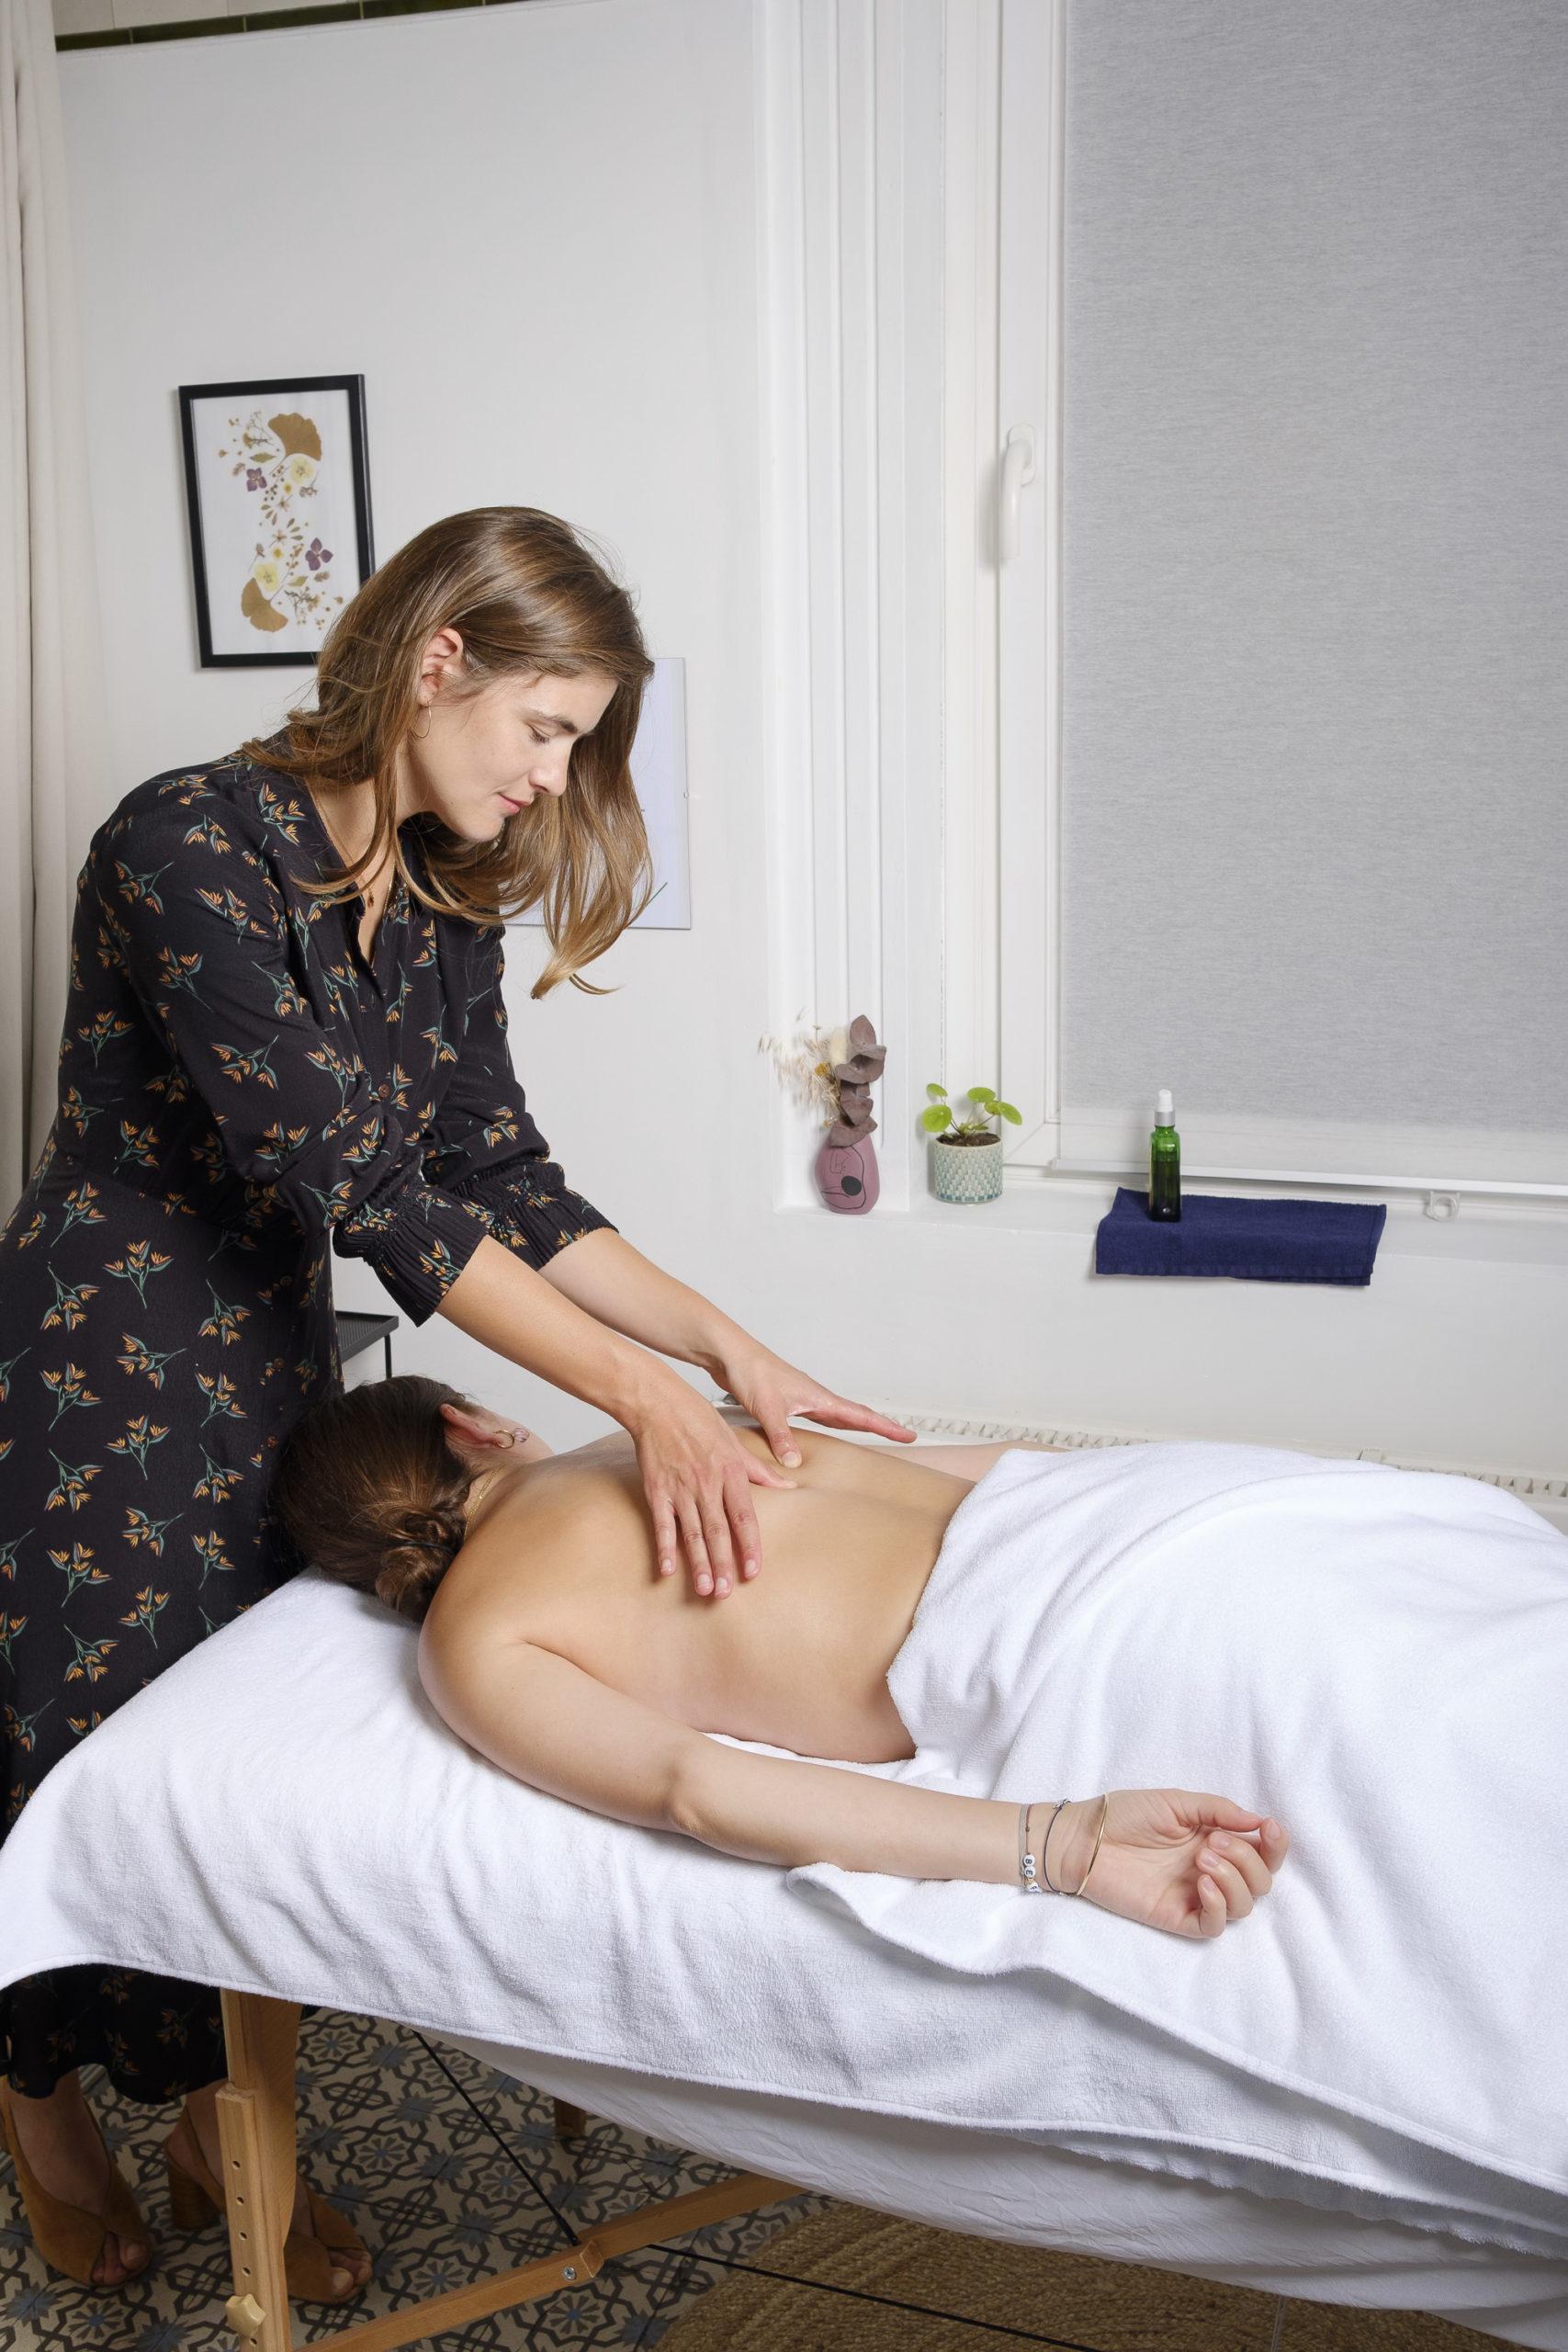 Massage-Bien-Être Naturopathe Hem Marcq-en-Baroeul